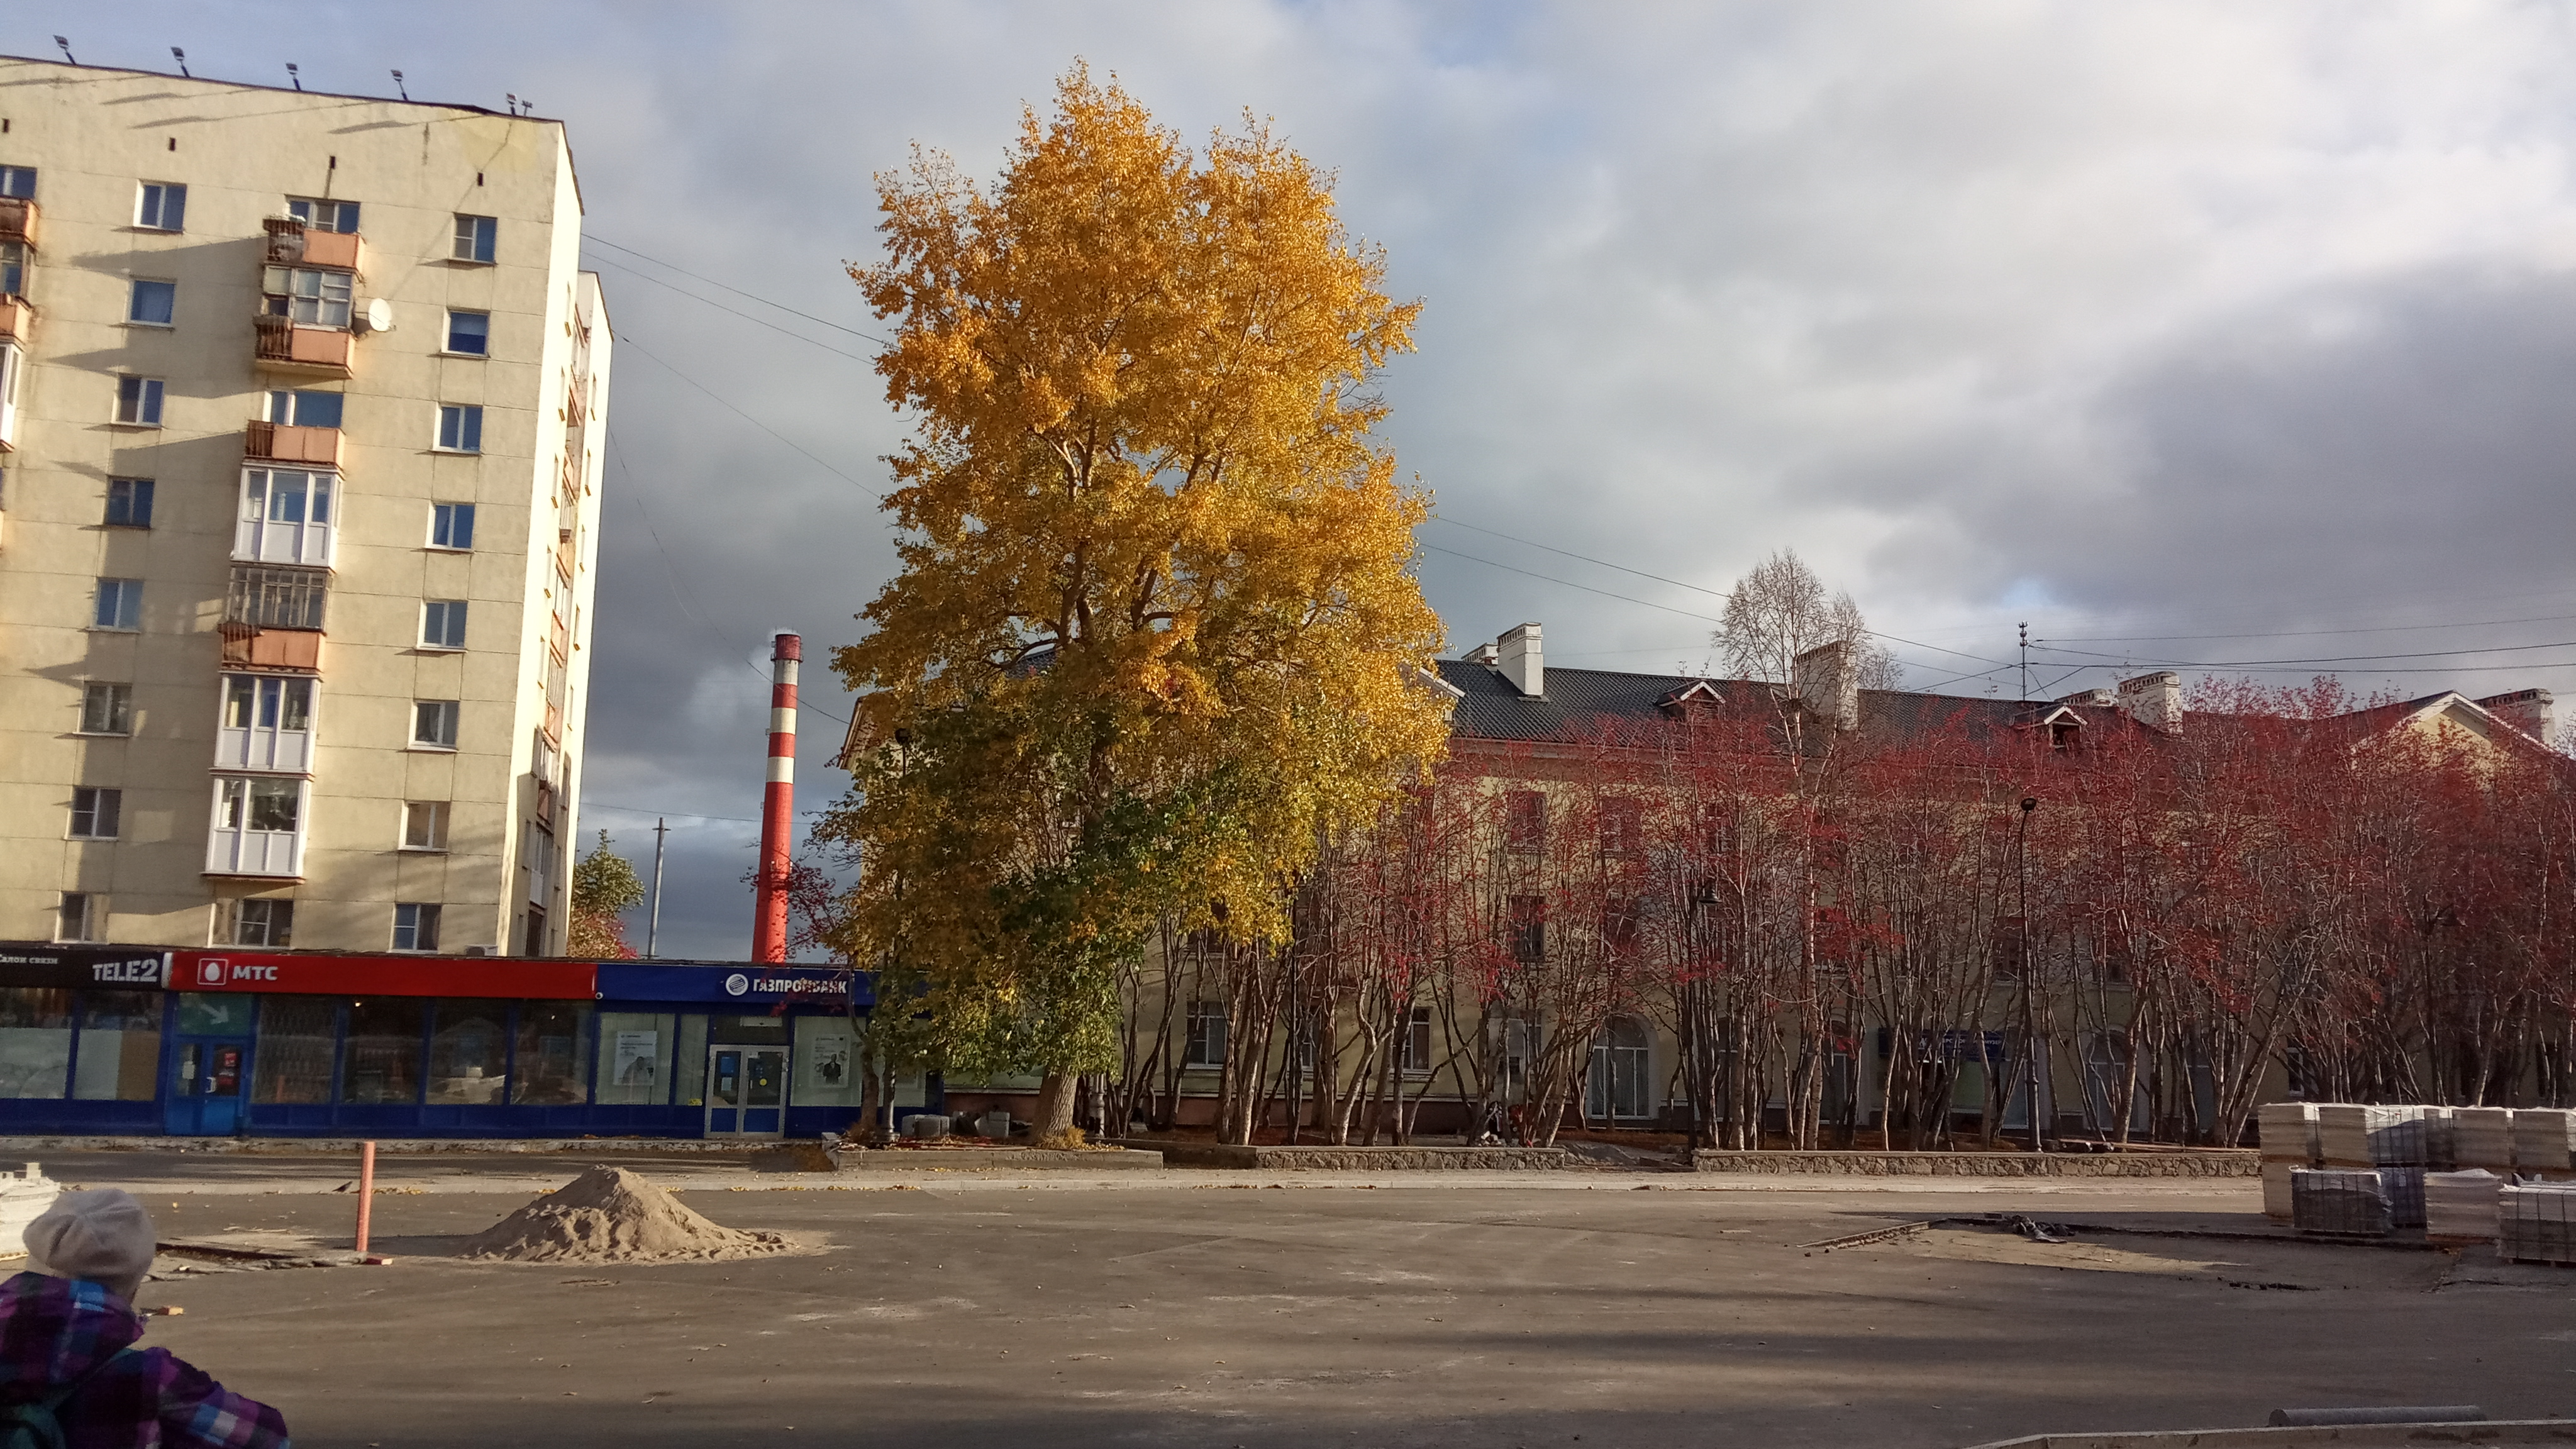 https://forumupload.ru/uploads/0019/c0/18/2/813005.jpg